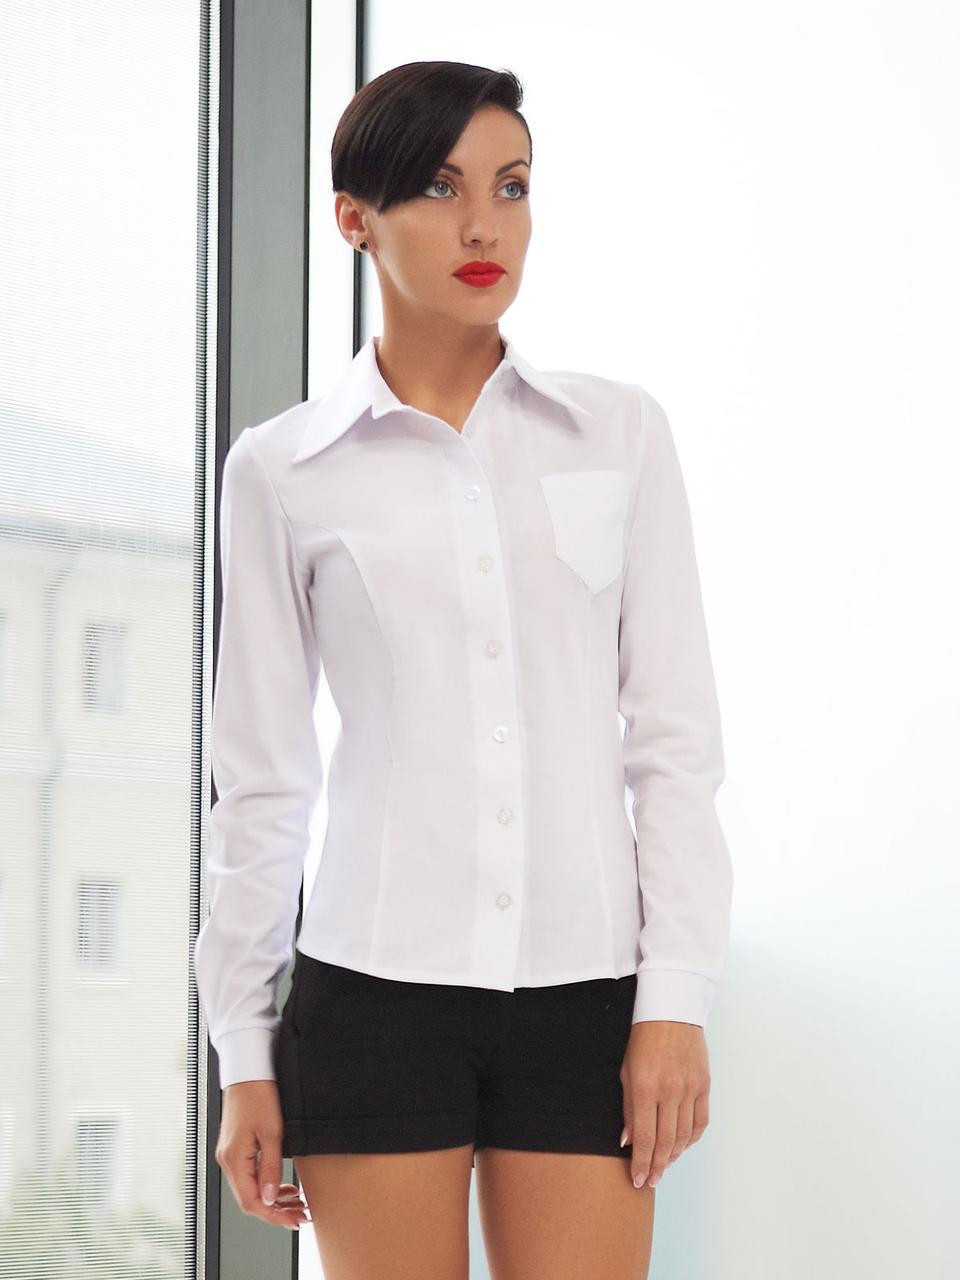 b945bf71fce Рубашка женская Марта д р